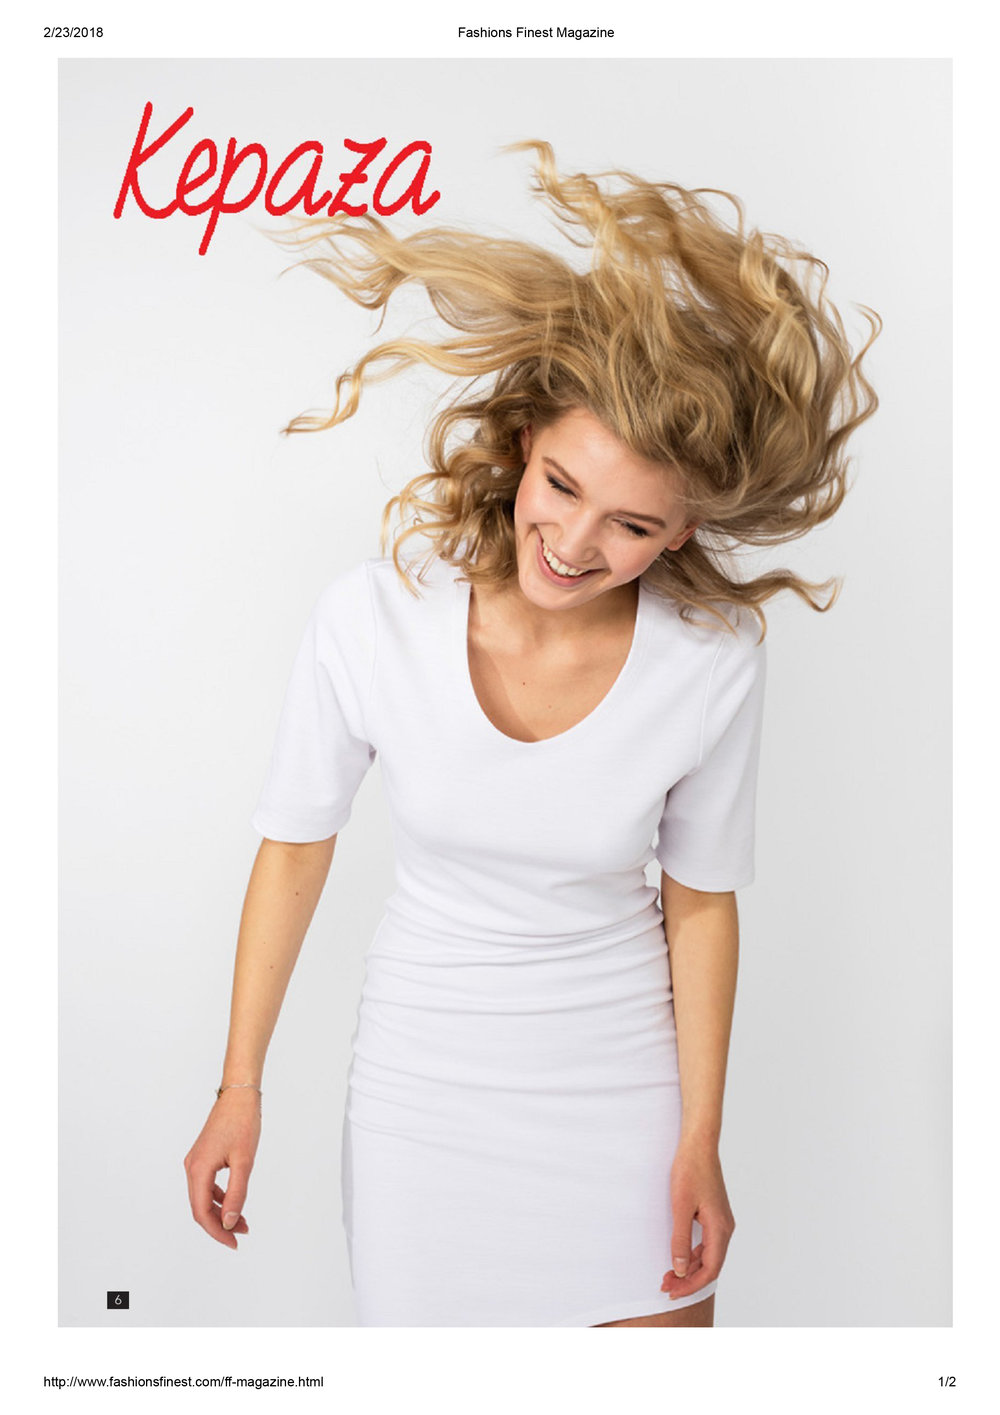 Fashions Finest Magazine - kepaza and editor's note-1.jpg